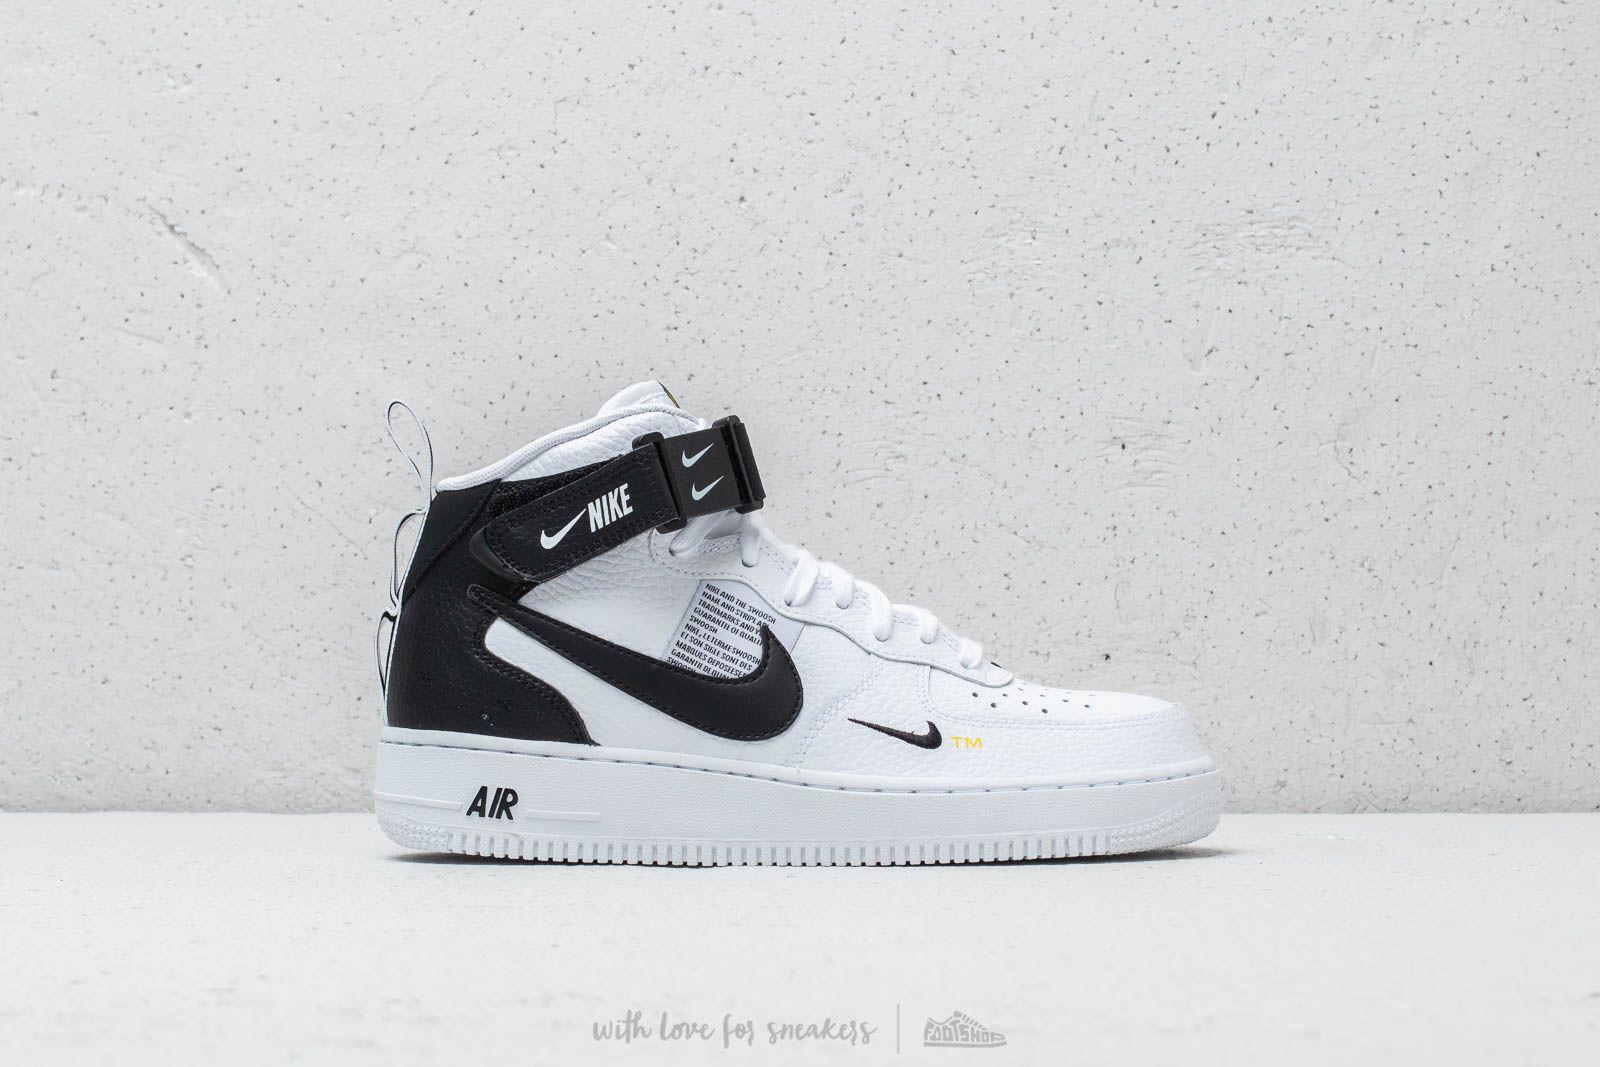 Nike Air Force 1 Mid '07 Lv8 White Black Tour Yellow | Footshop